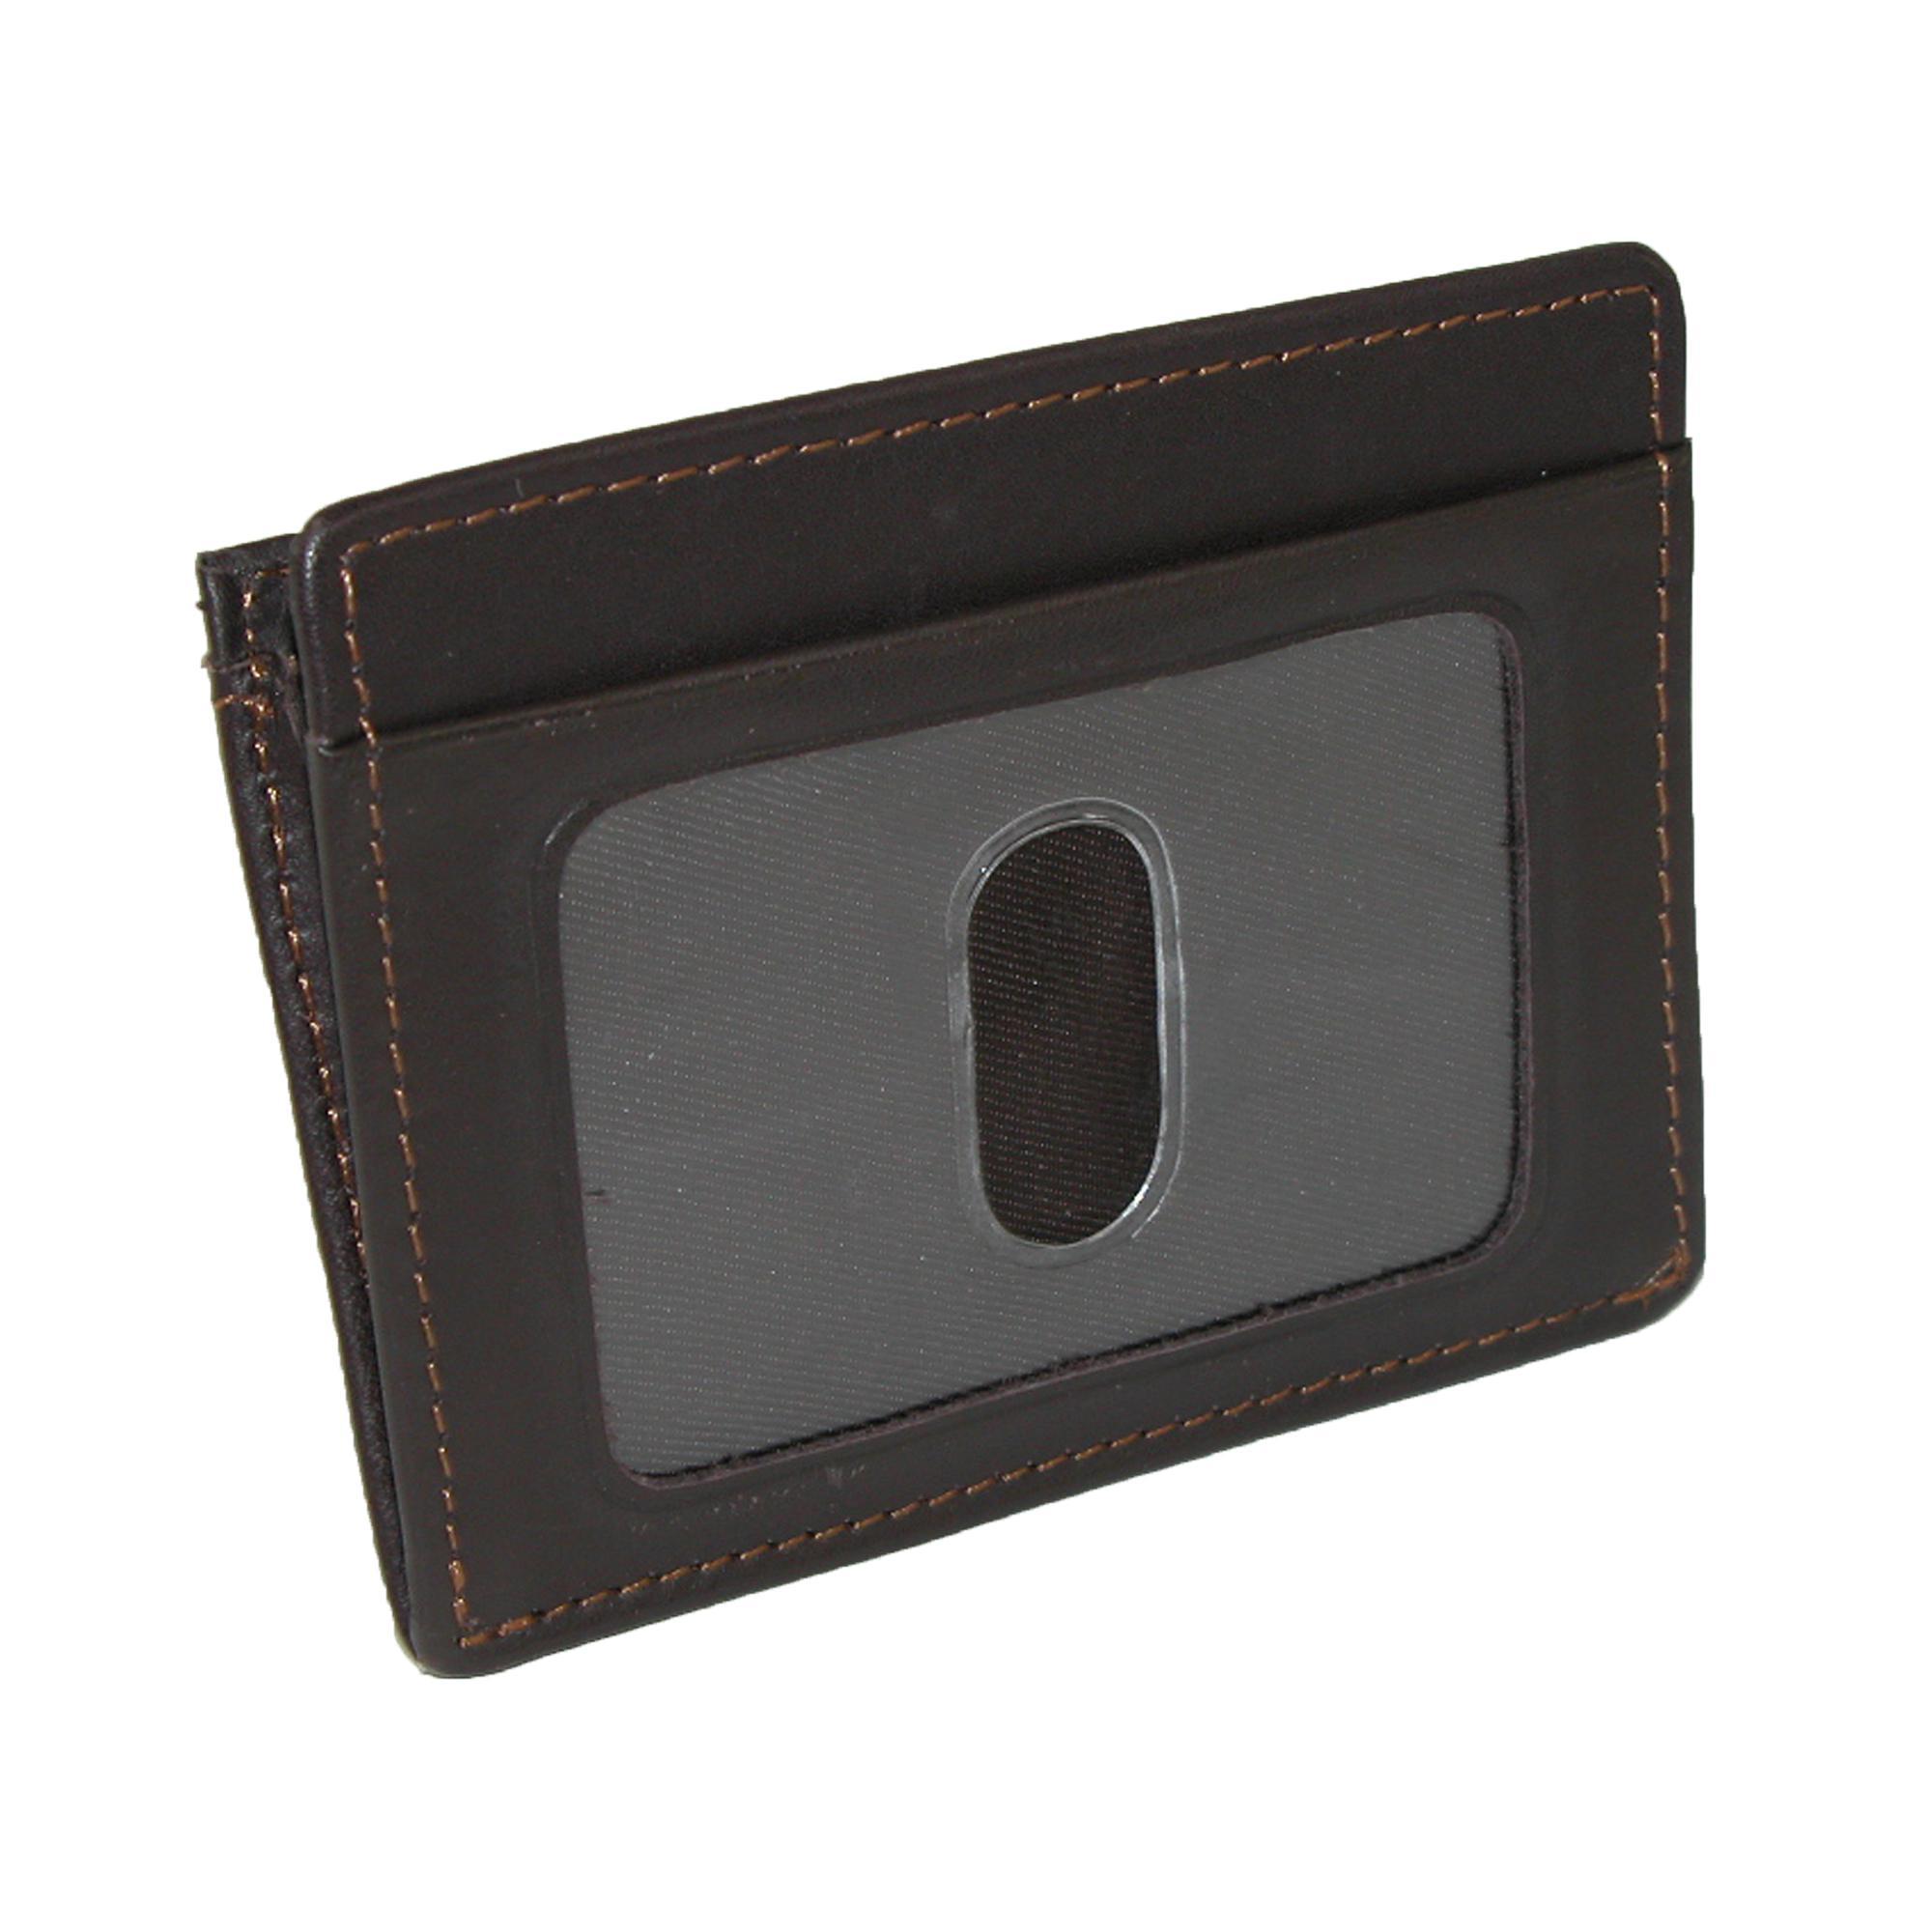 Trip Machine Compnay PASSPORT//FIELDNOTE//EXPLORER WALLET BLACK